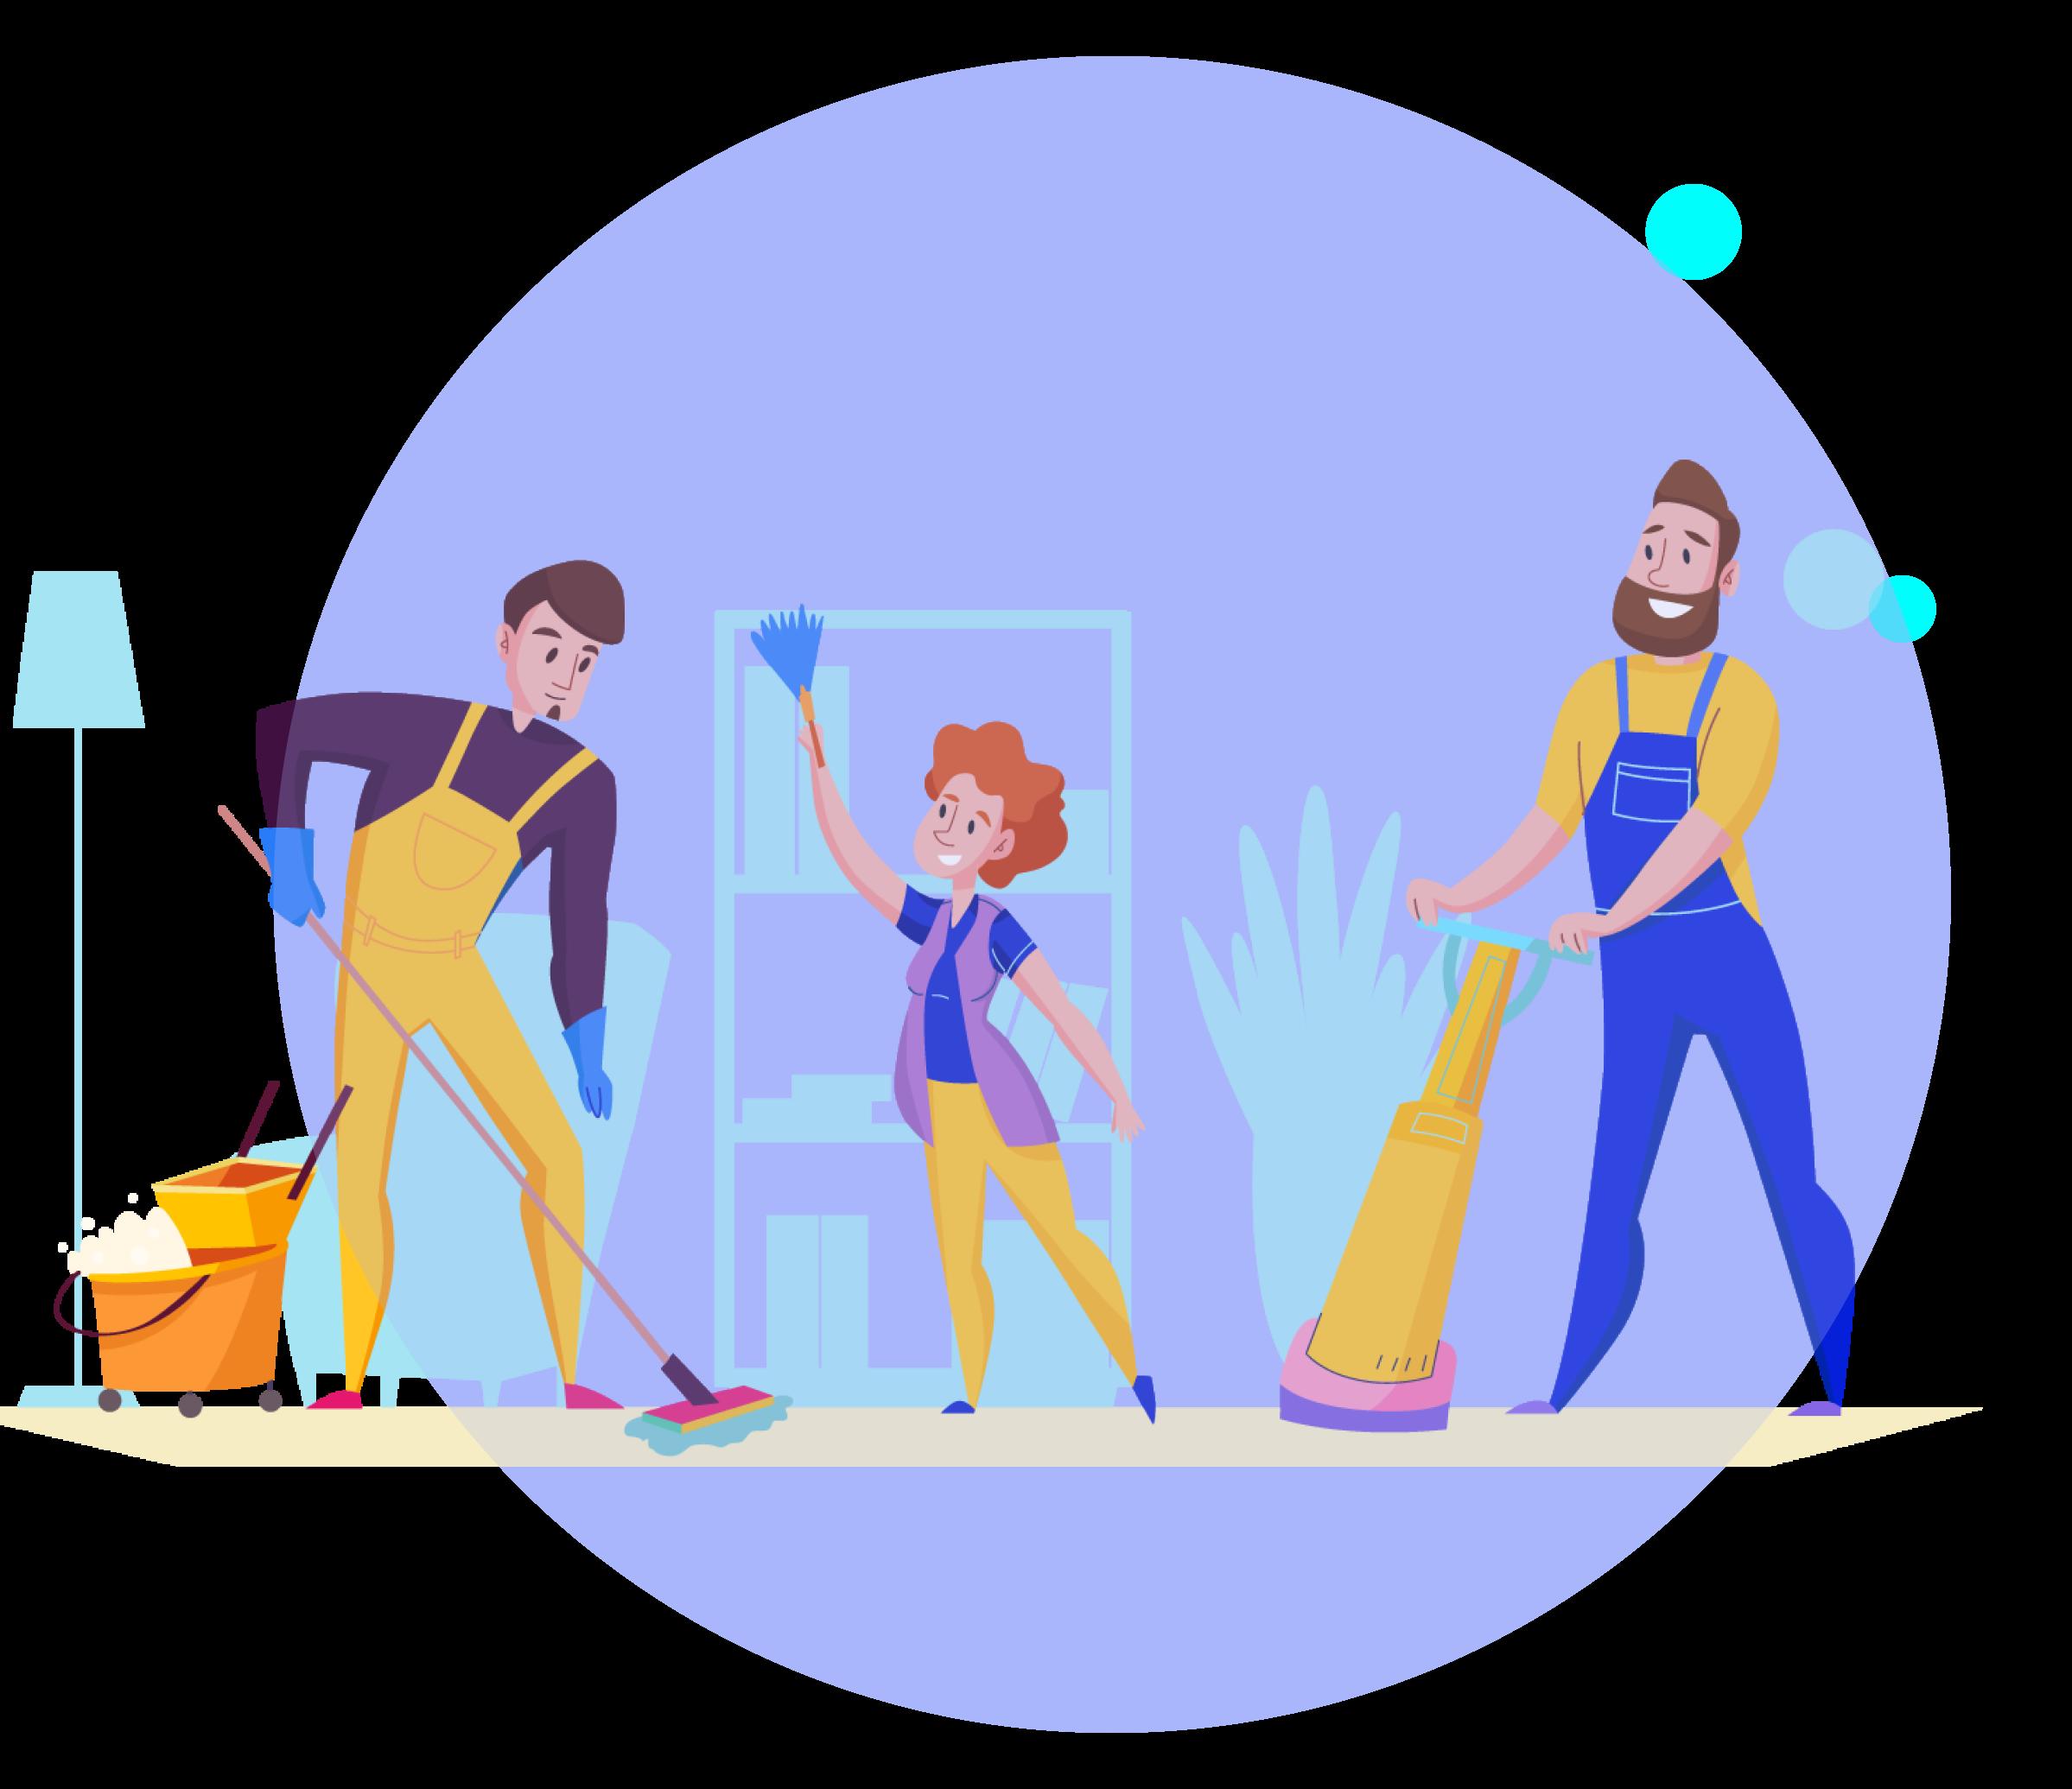 Illustration team ménage sur fond bleu